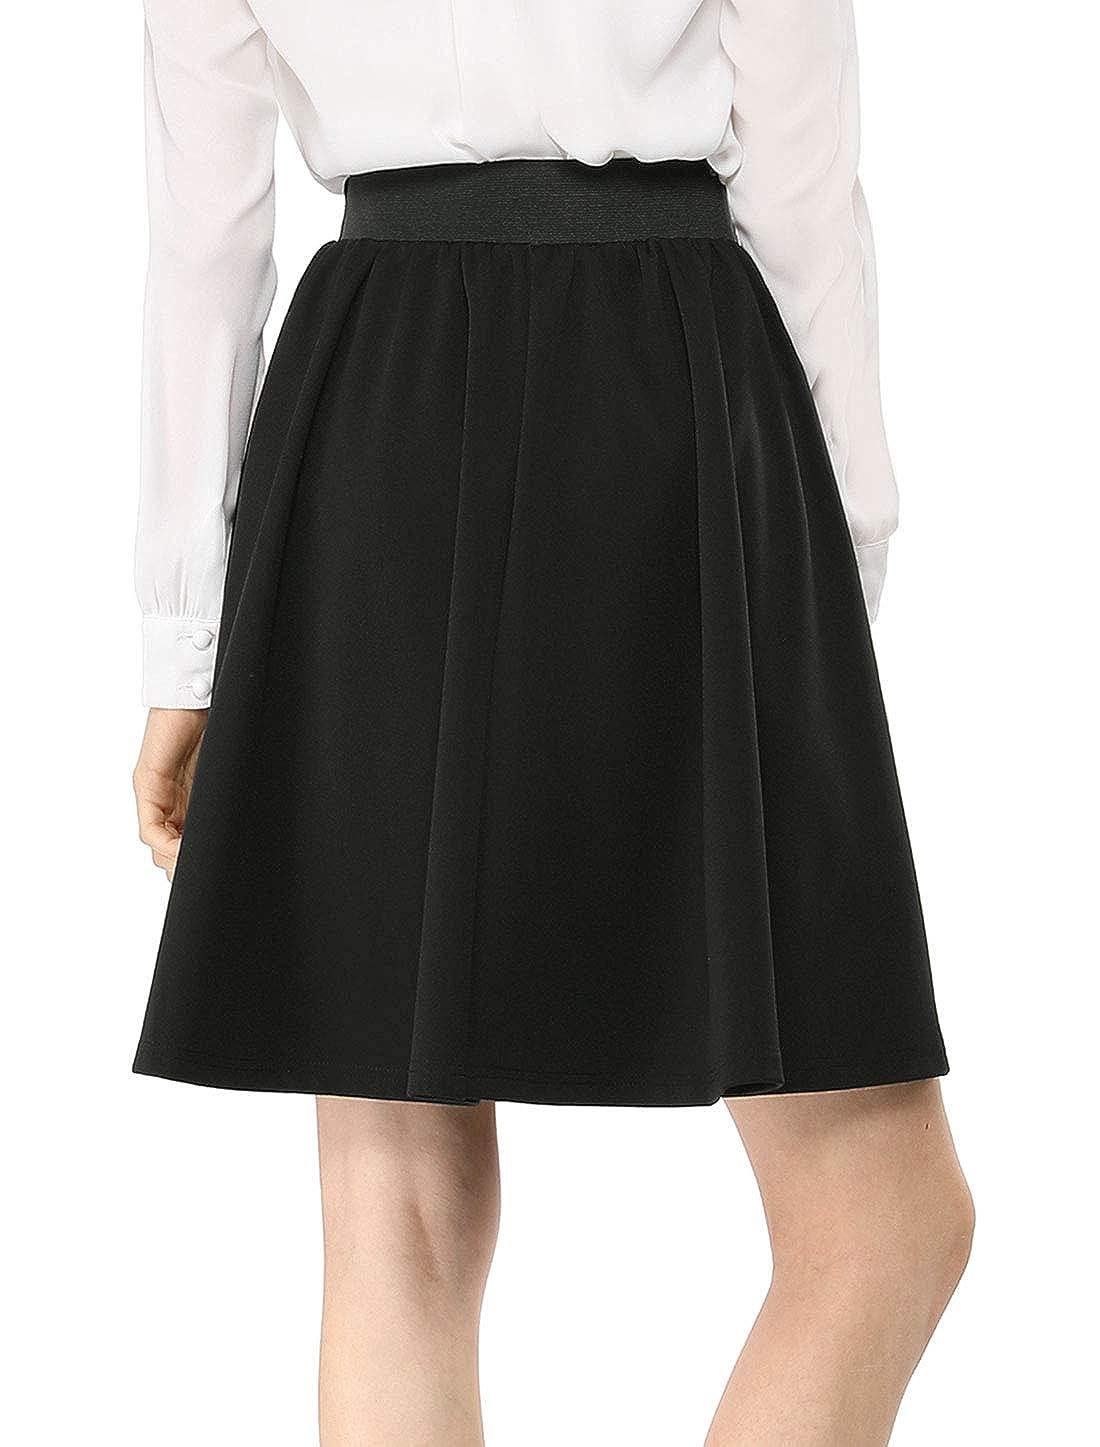 1cbff6eaf Allegra K Women's Casual Basic Above Knee Stretchy A Line Flared Skater  Skirt at Amazon Women's Clothing store: